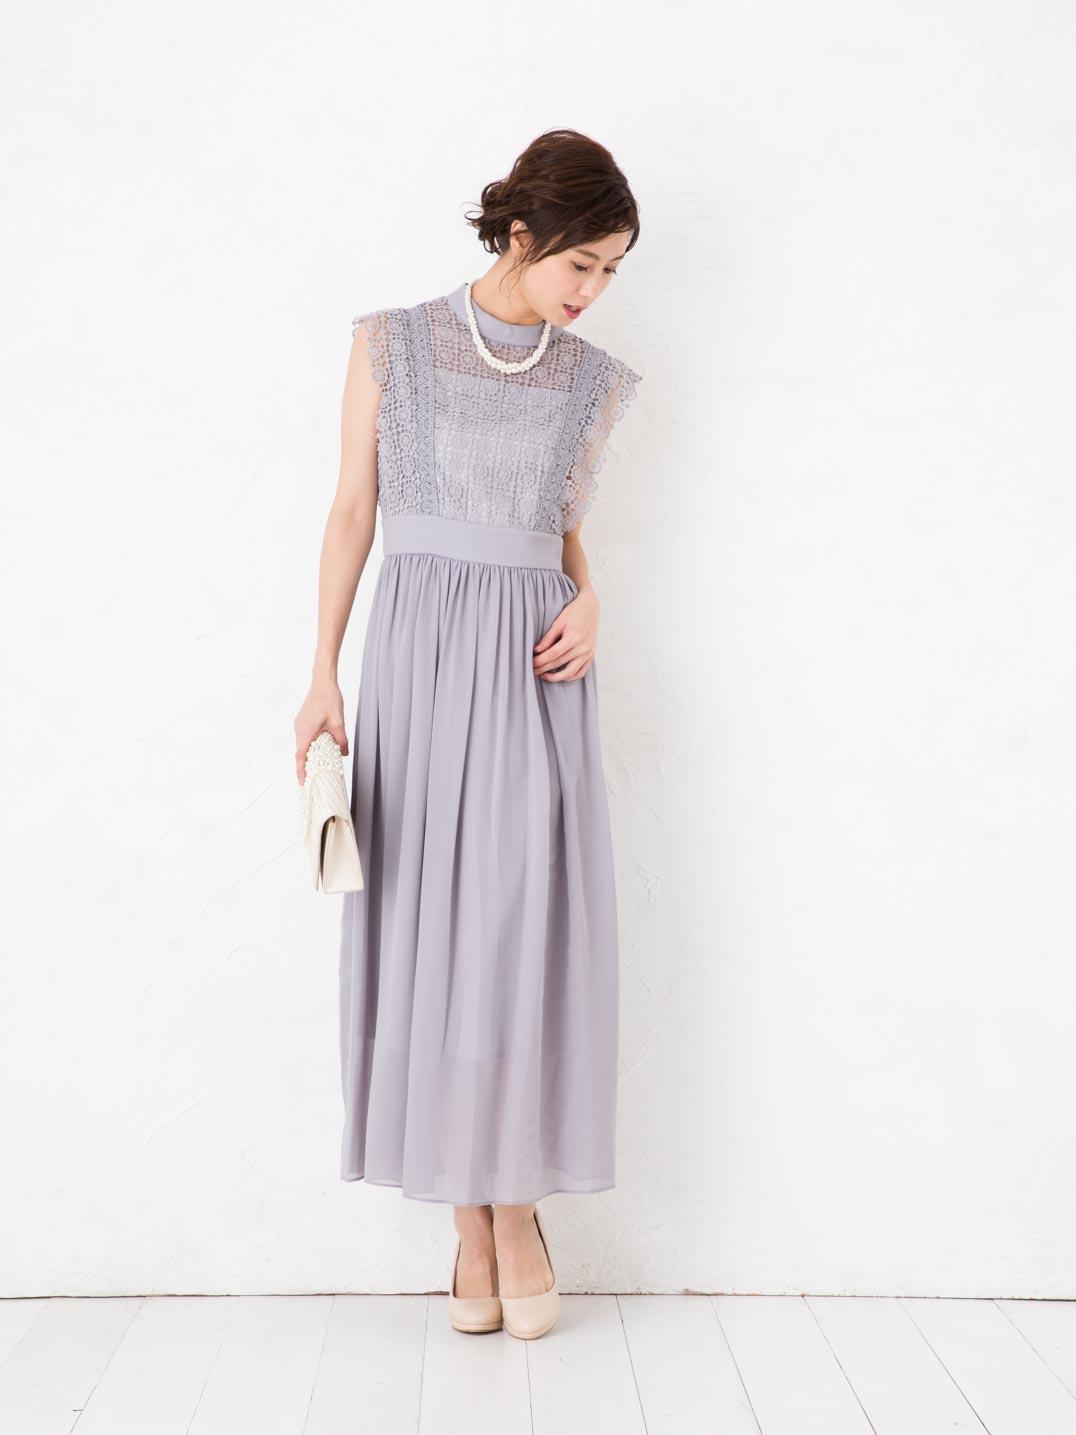 Je super ドレス / Mサイズ (DOC0164)